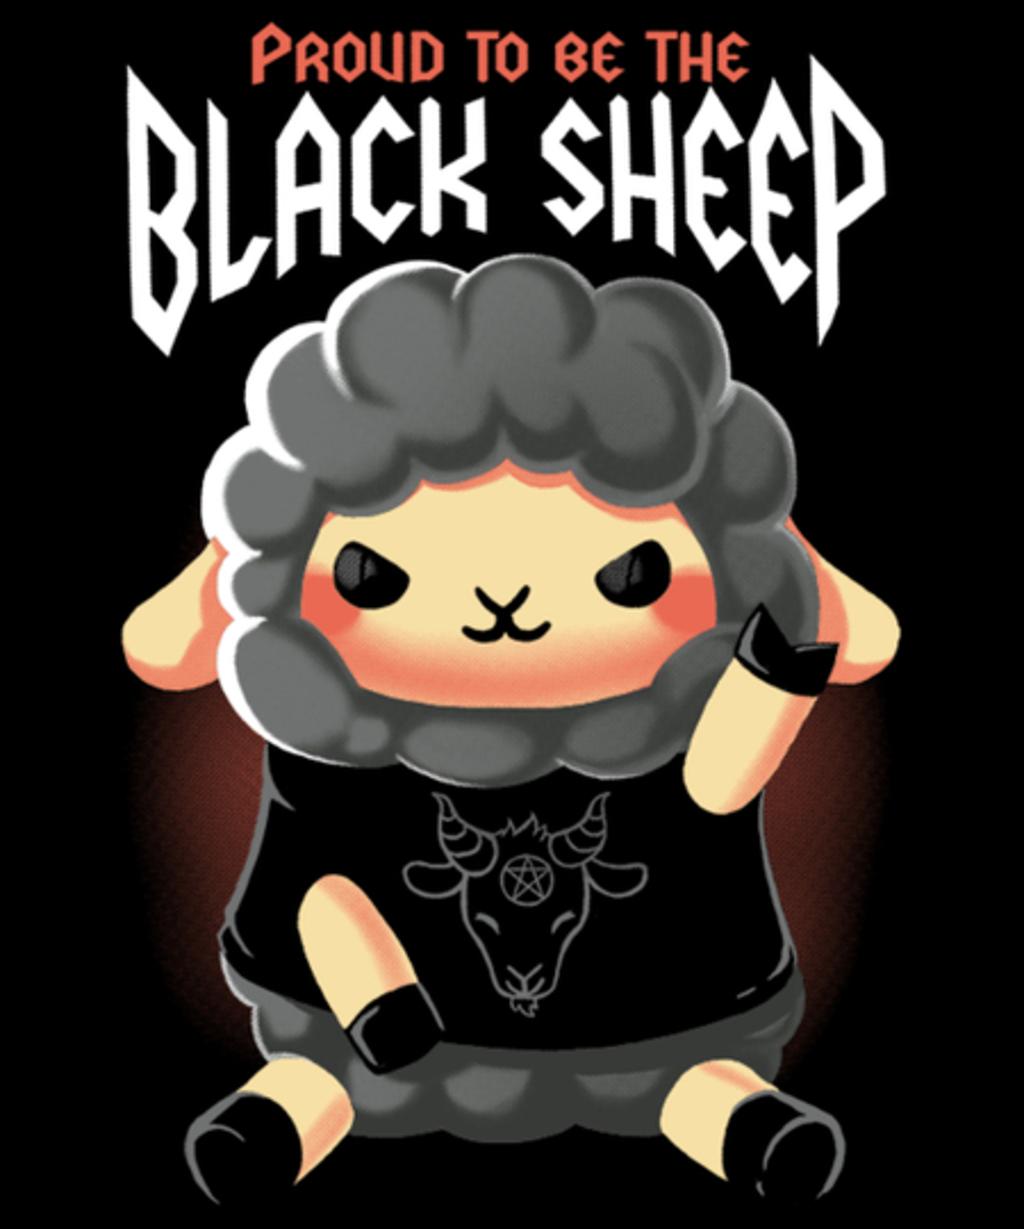 Qwertee: Black sheep